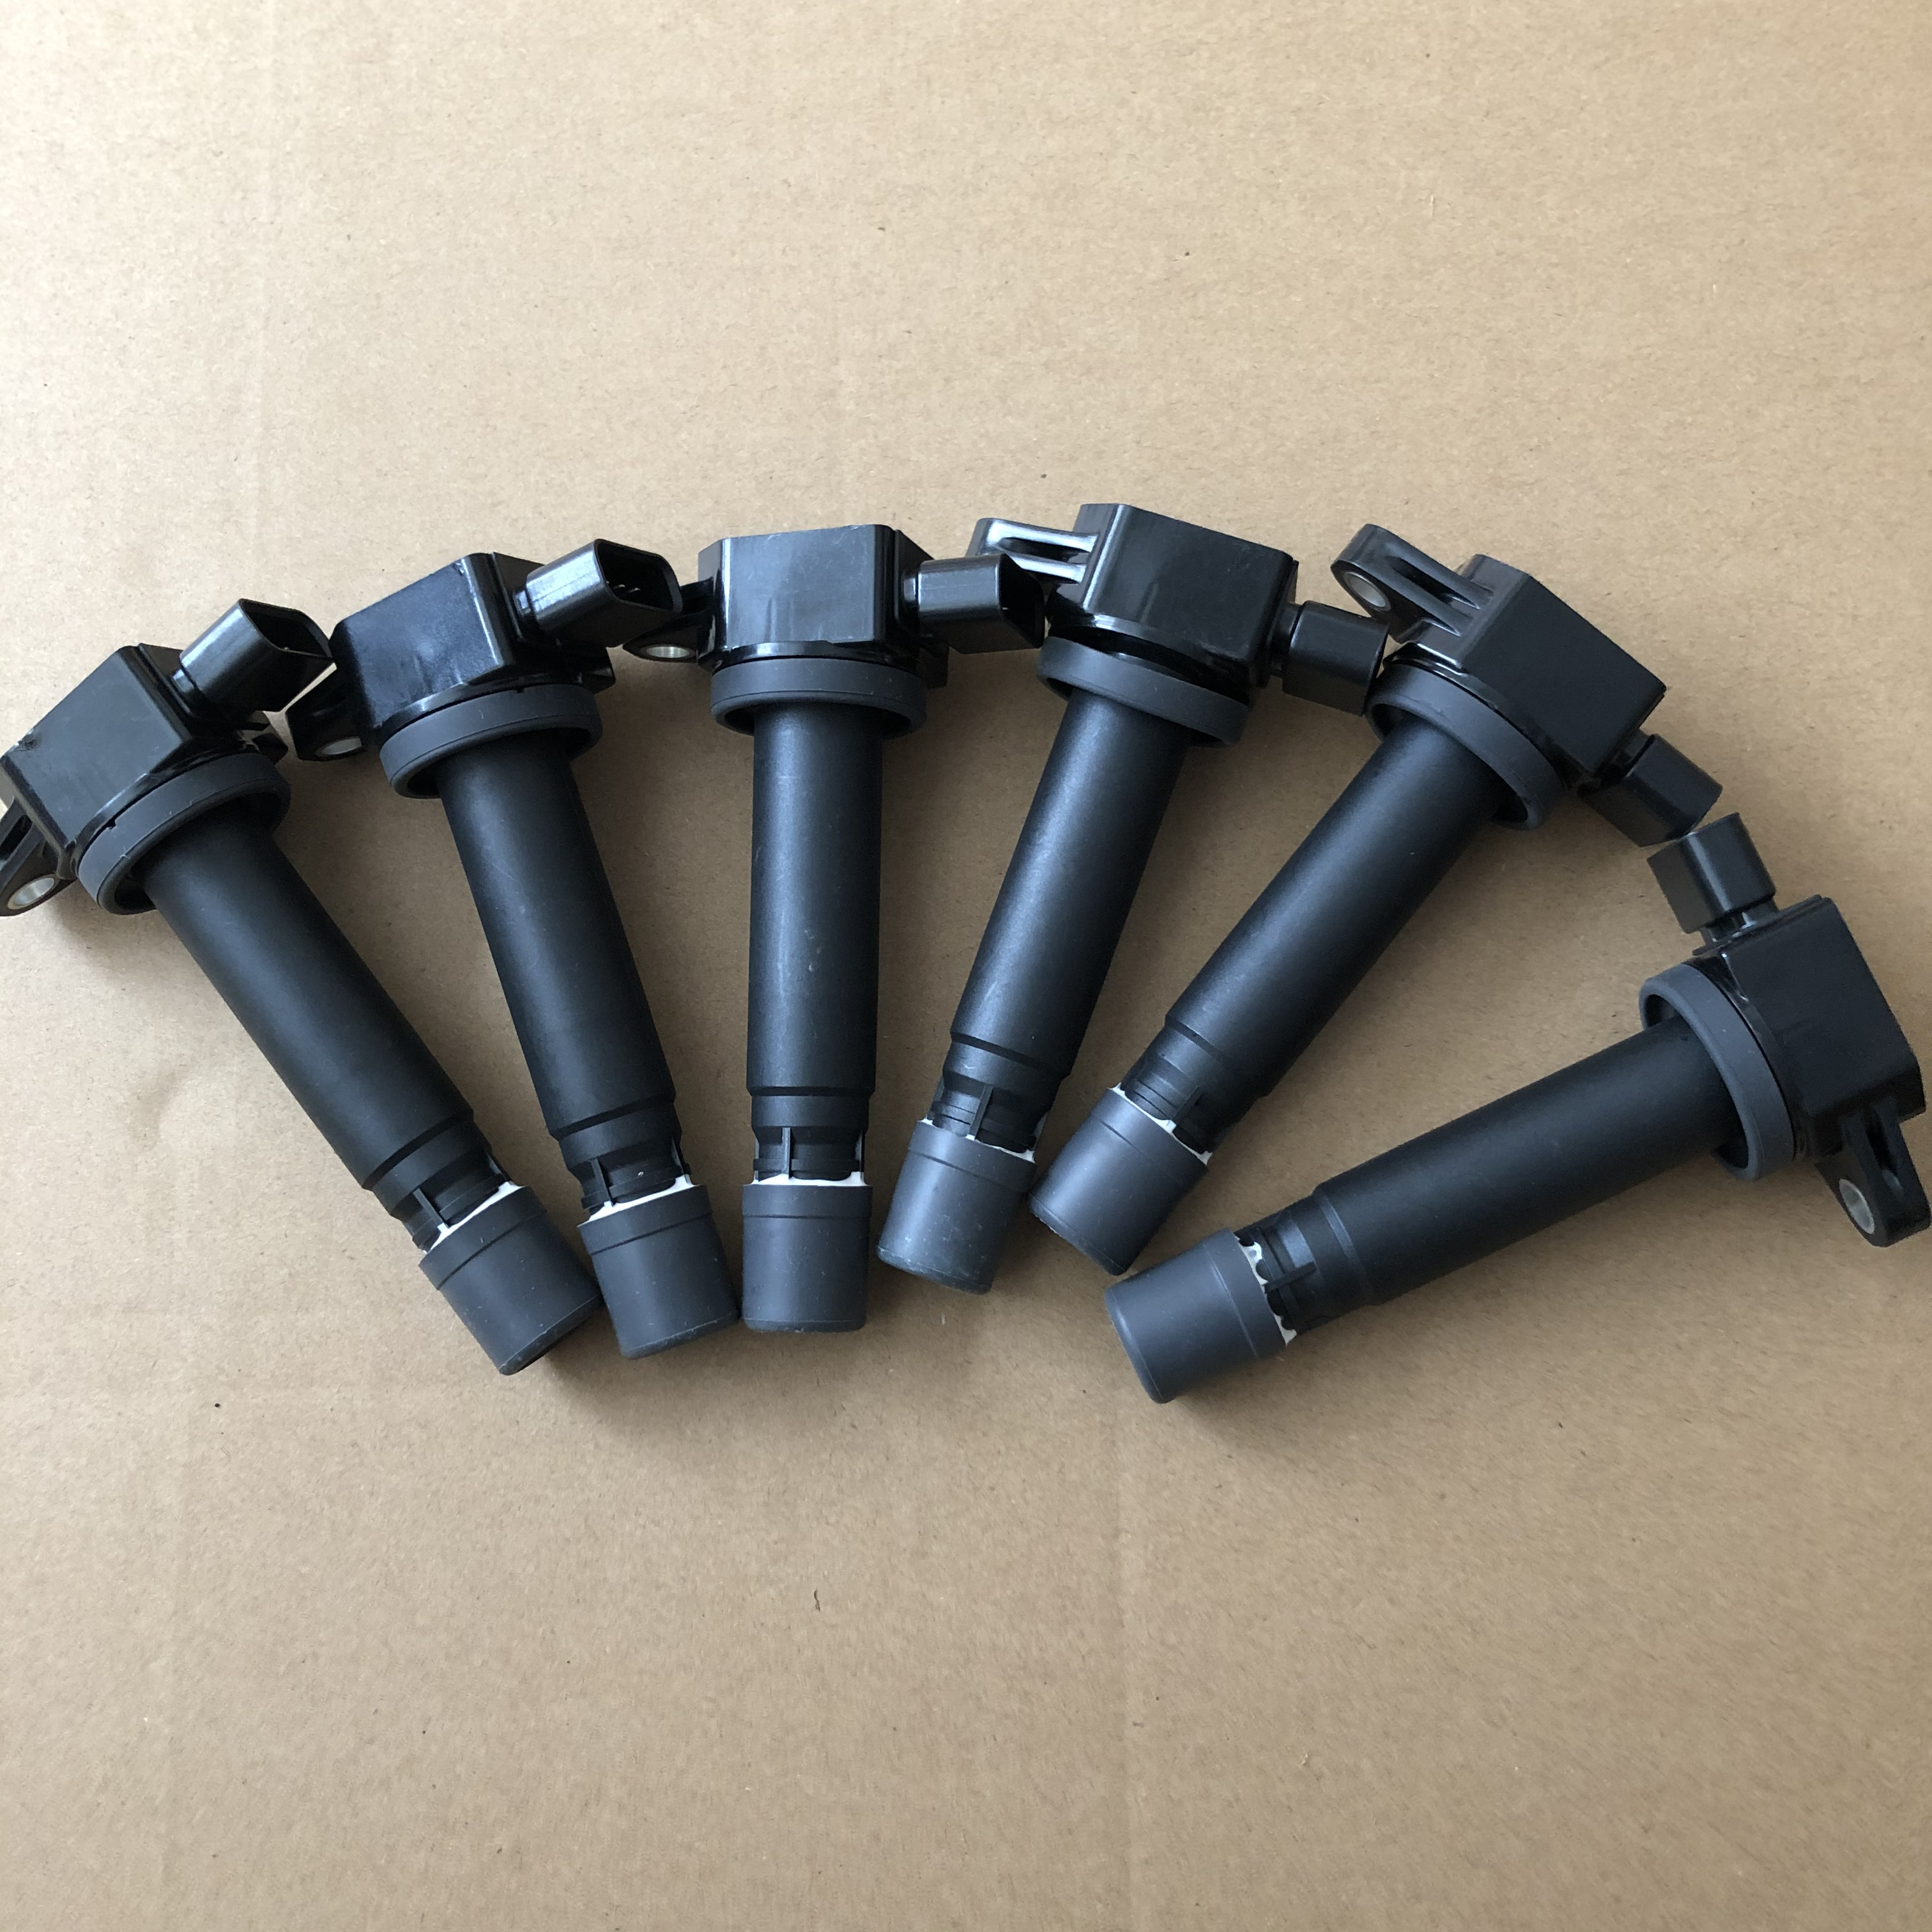 8PCS New Ignition Coil For 05-11 Volvo XC90 4.4L-V8 C1722 UF574